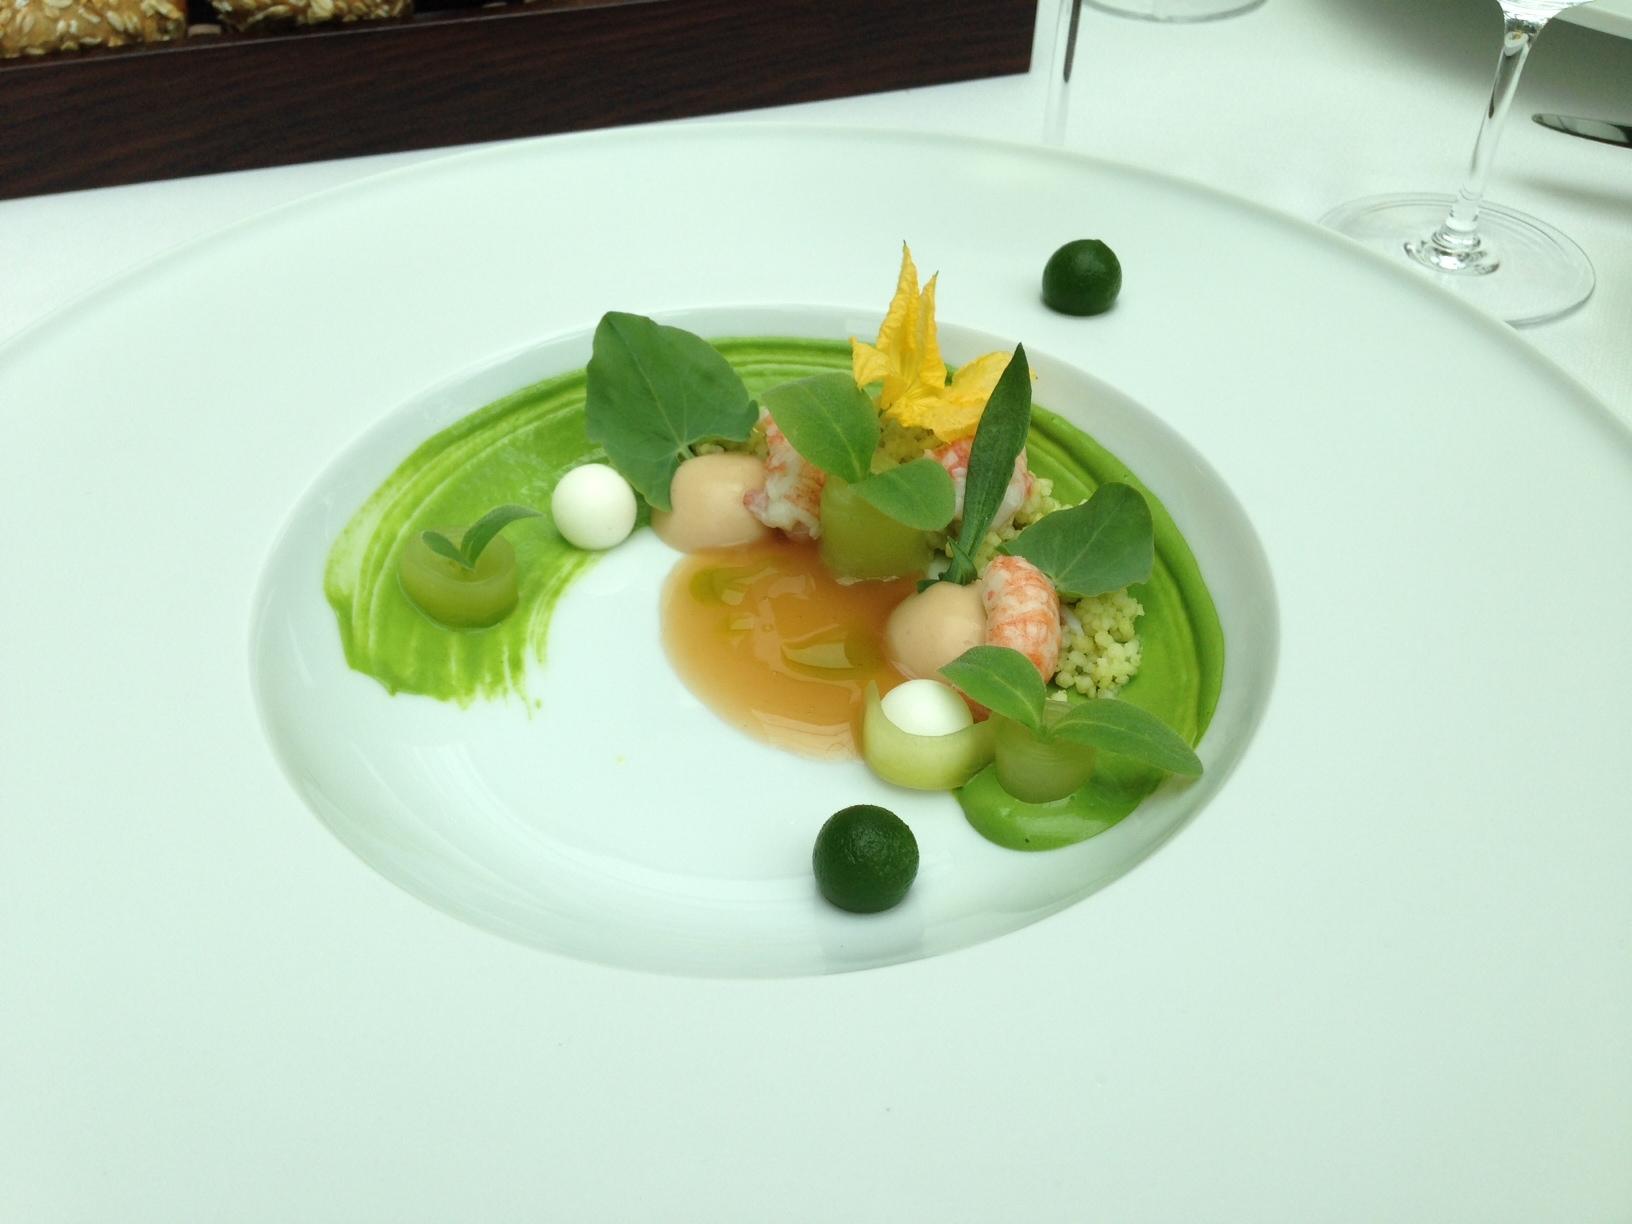 Bachkrebsen – Sauerampfer, Couscoussalat, eingelegte Gurke